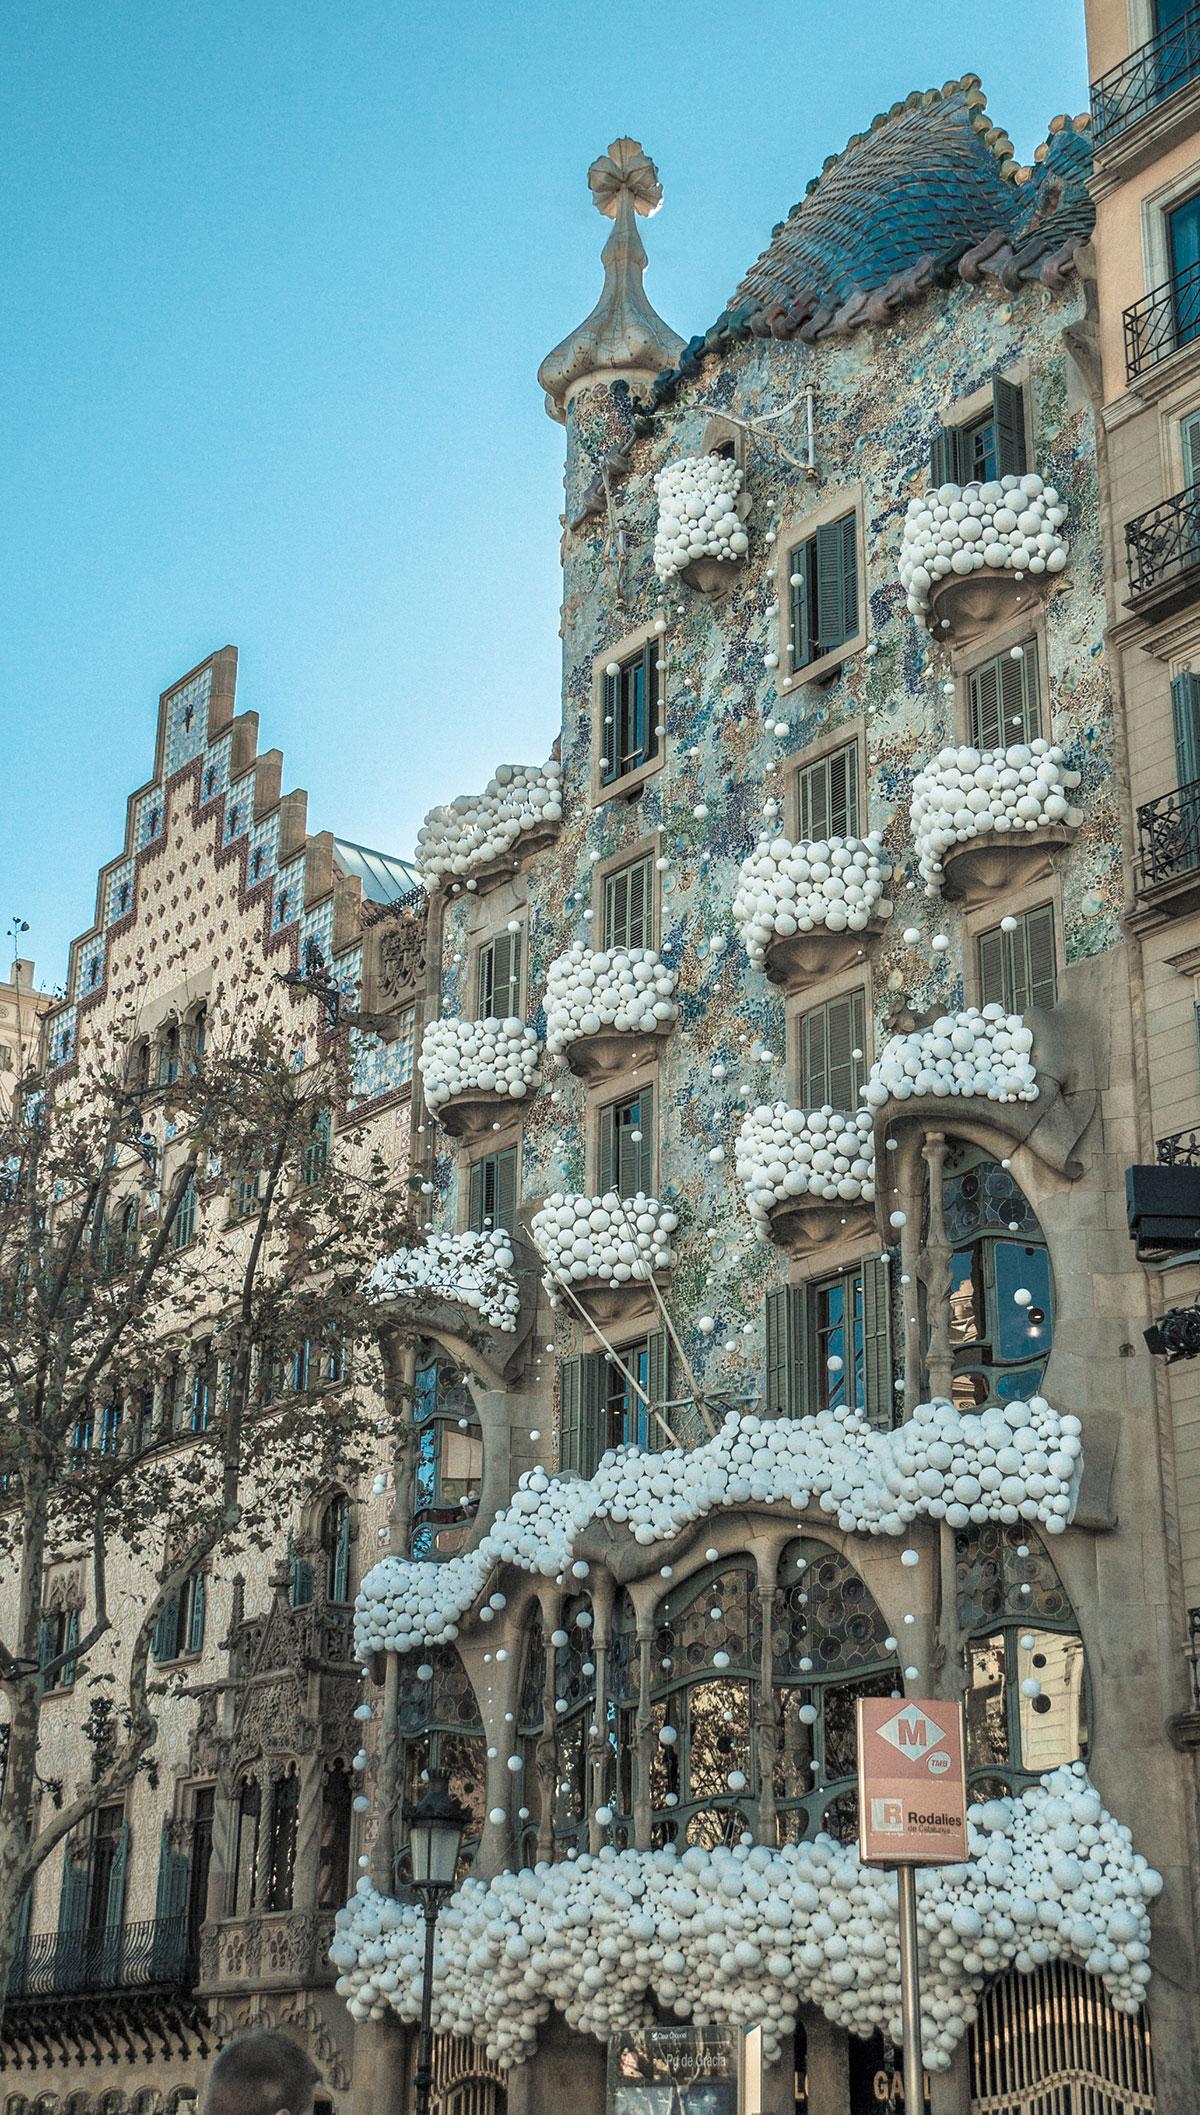 Barcelona - Gaudi - Cassa Batllo